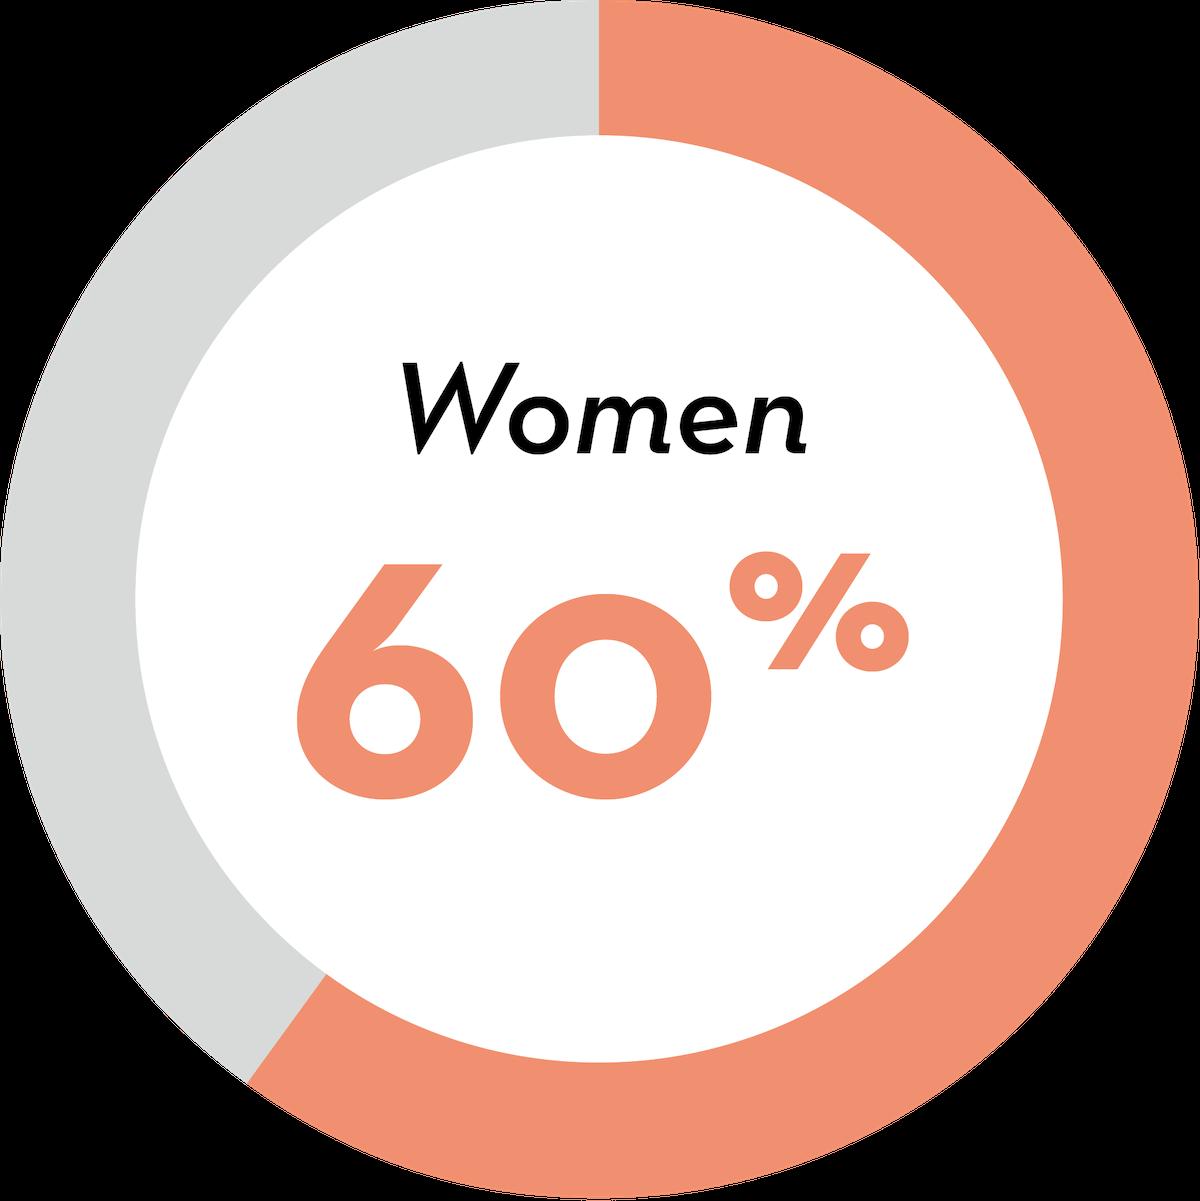 Woman: 60 percent